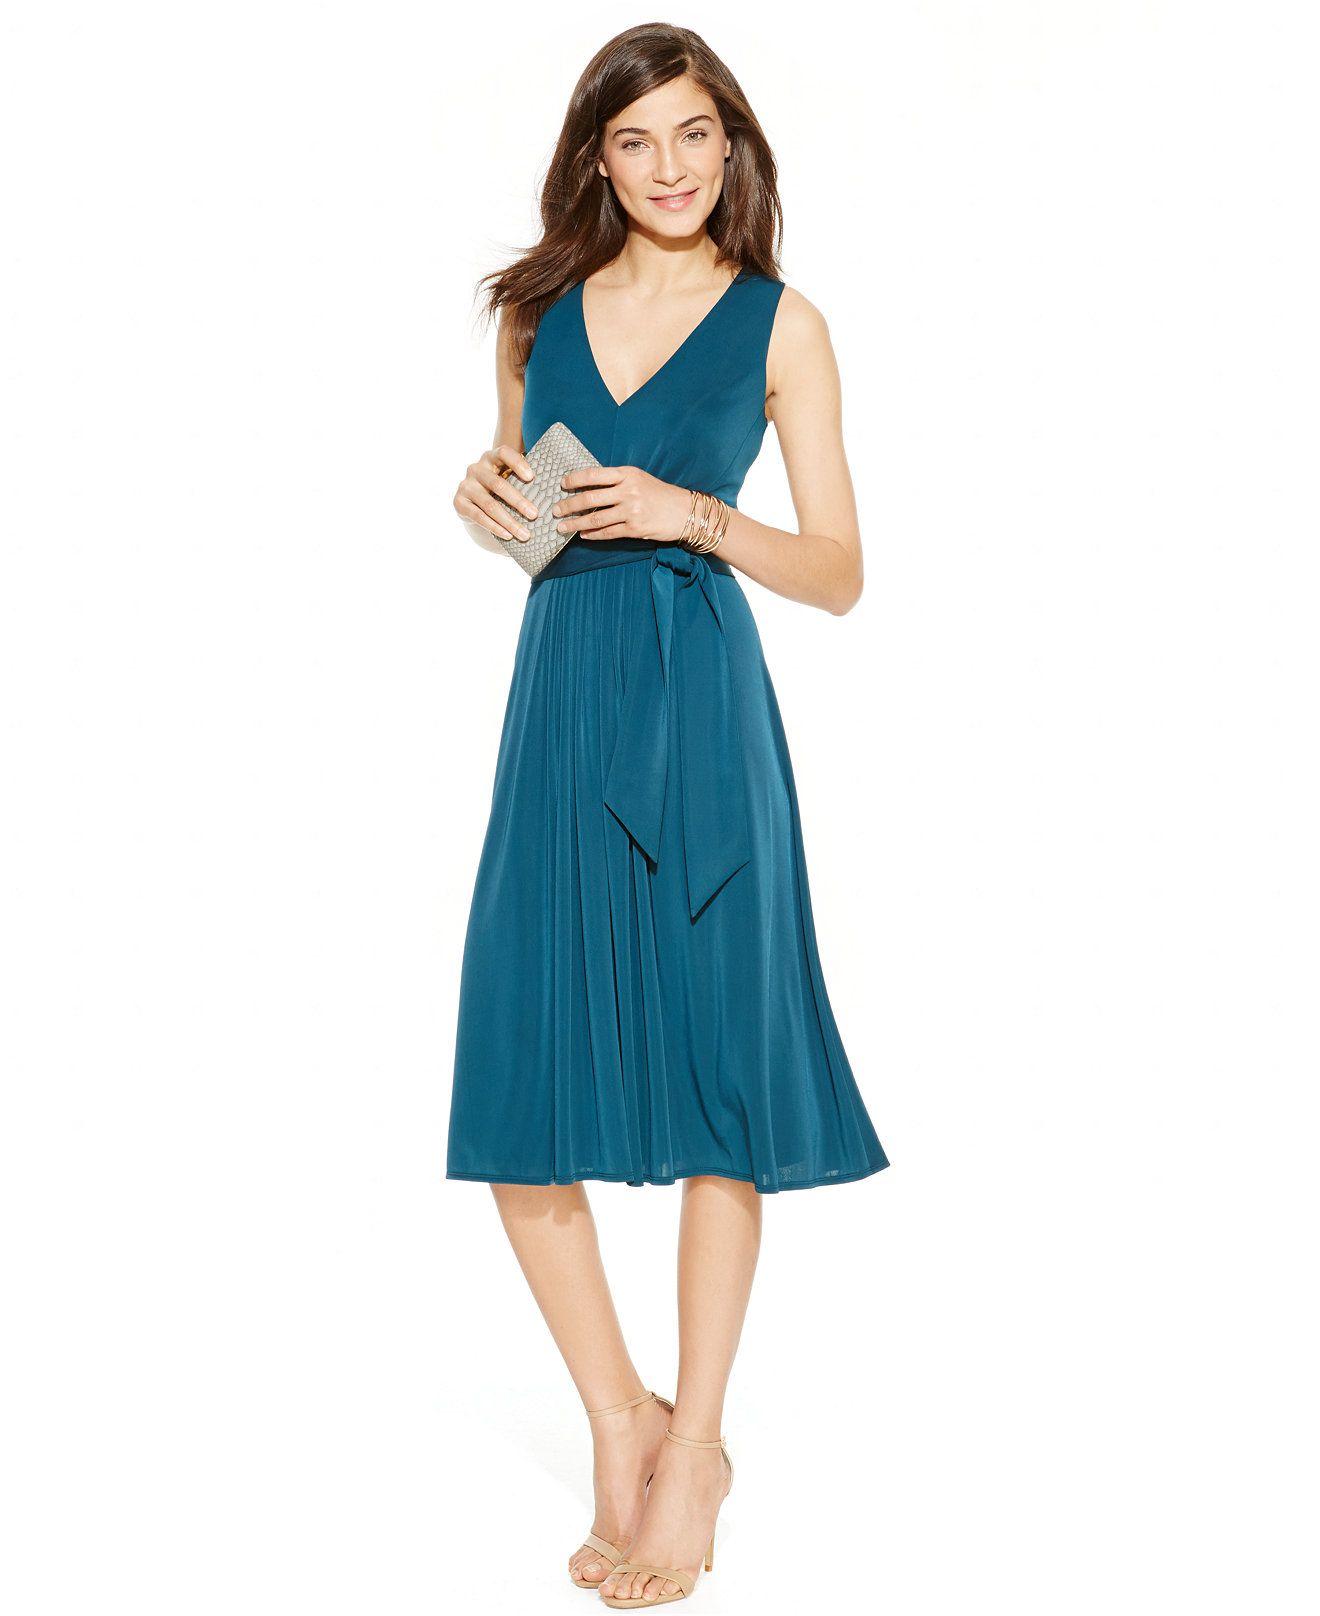 Anne Klein Sleeveless Belted A-Line Dress - Dresses - Women - Macy\'s ...